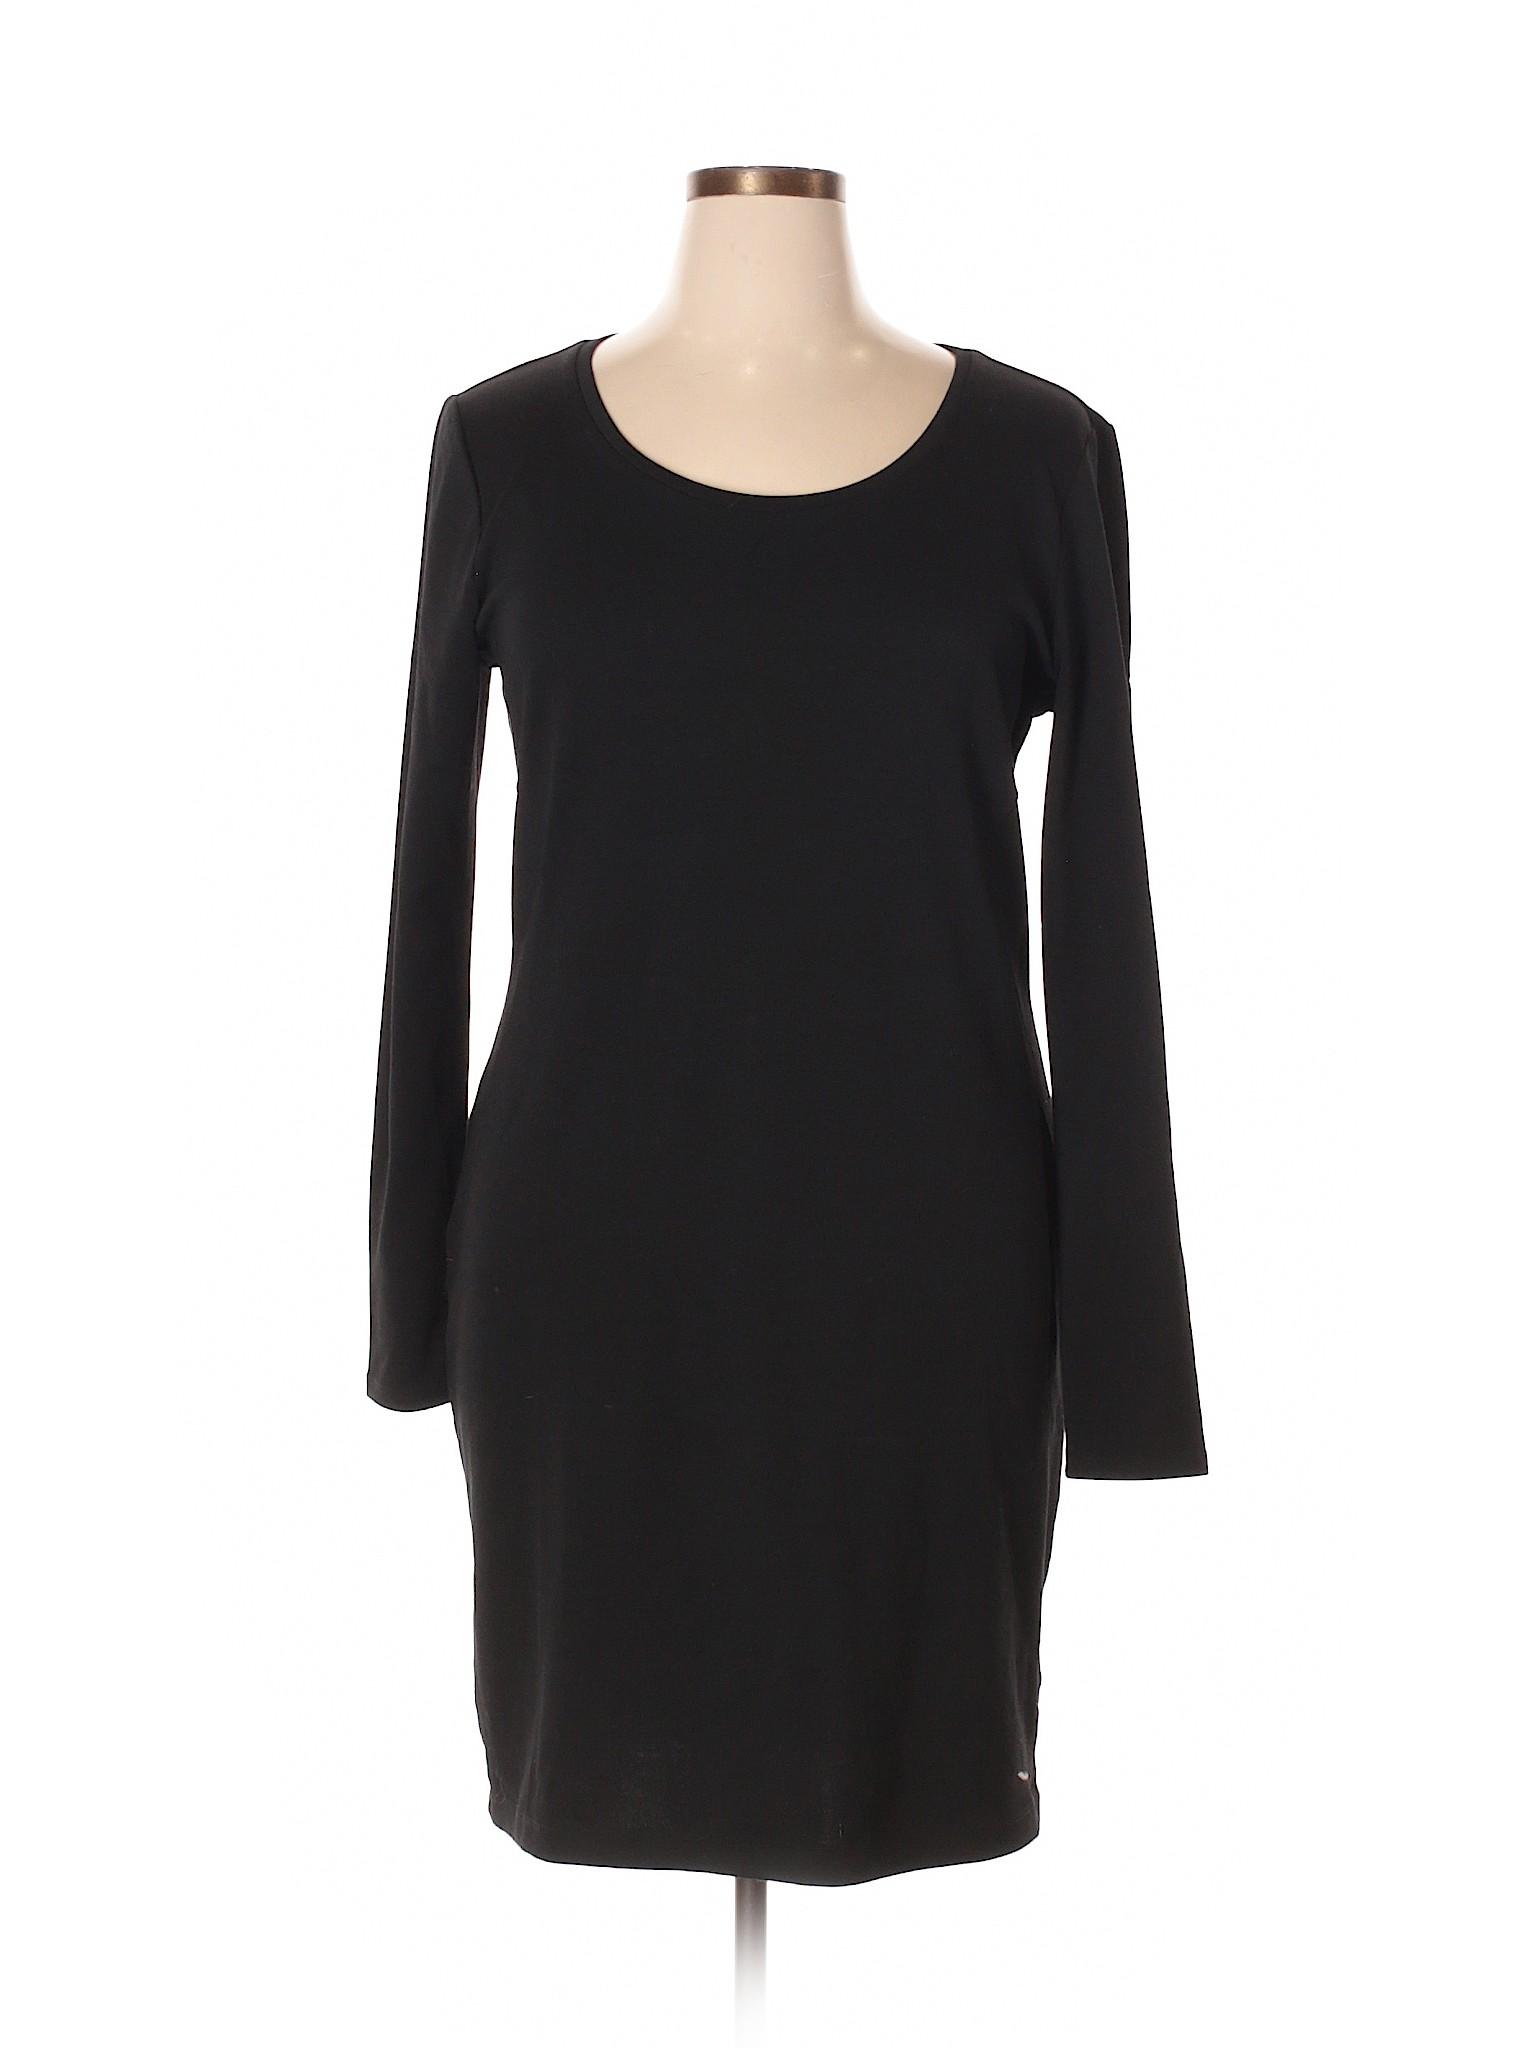 H amp;M Dress Casual Boutique winter fFnpCqnZwx